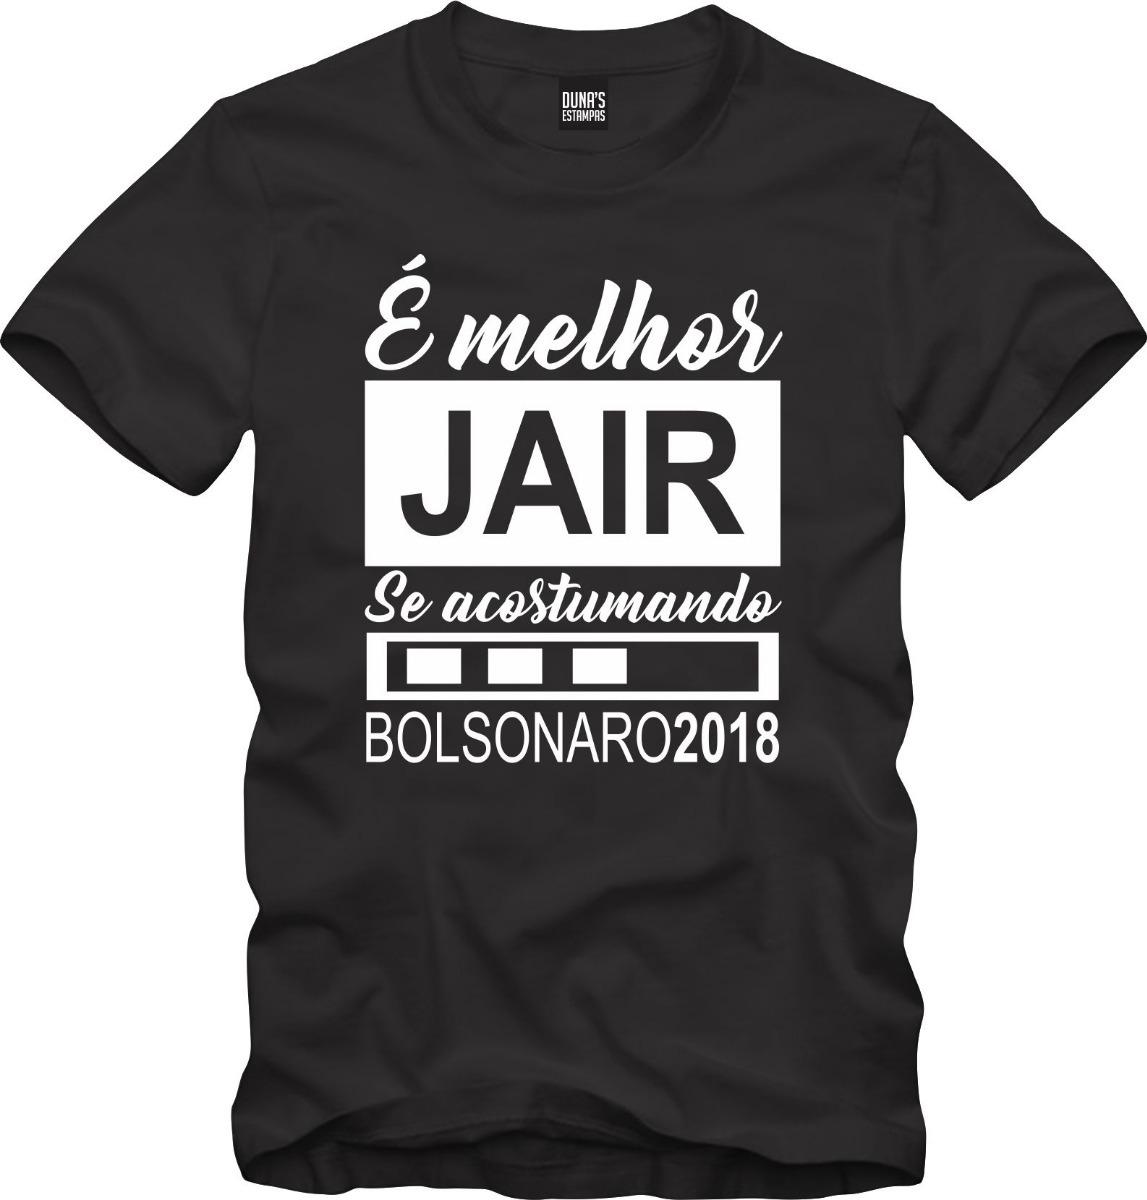 Camisa Melhor Jair Se Acostumando Bolsonaro Presidente 2018 R 42